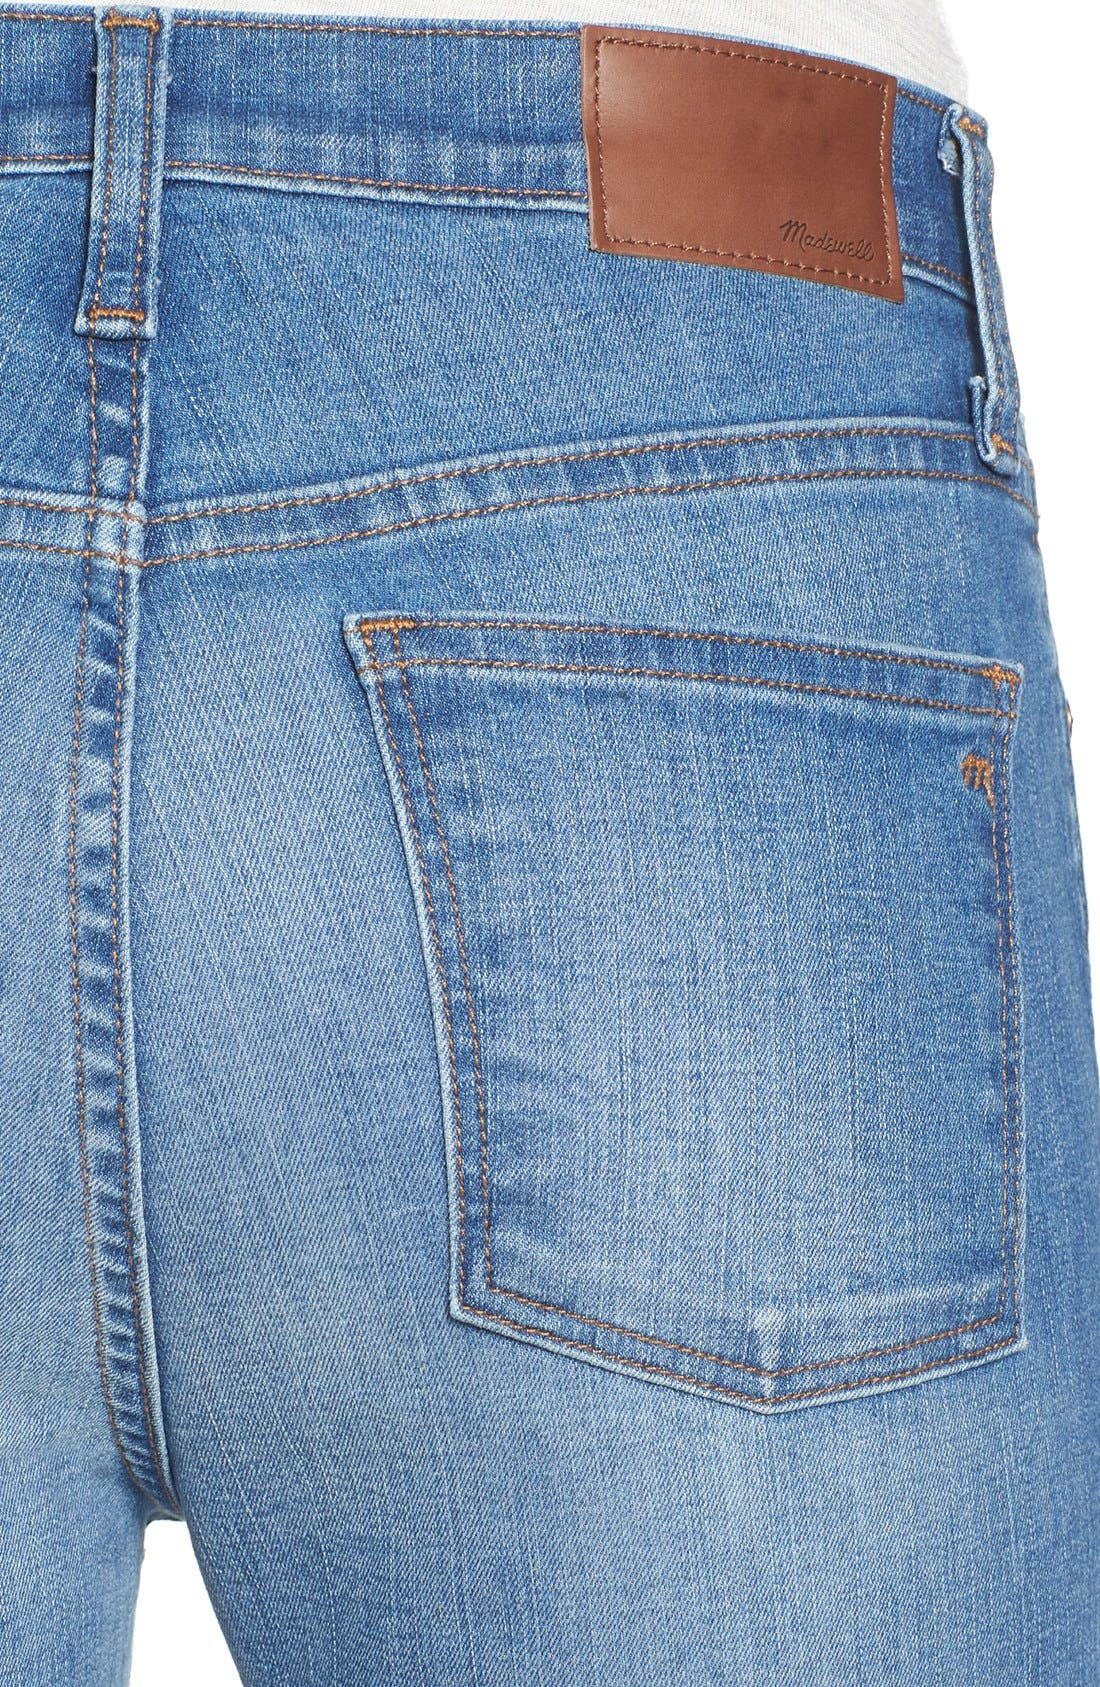 Alternate Image 5  - Madewell 'High Riser - Button Through' Crop Skinny Skinny Jeans (Kearney Wash)